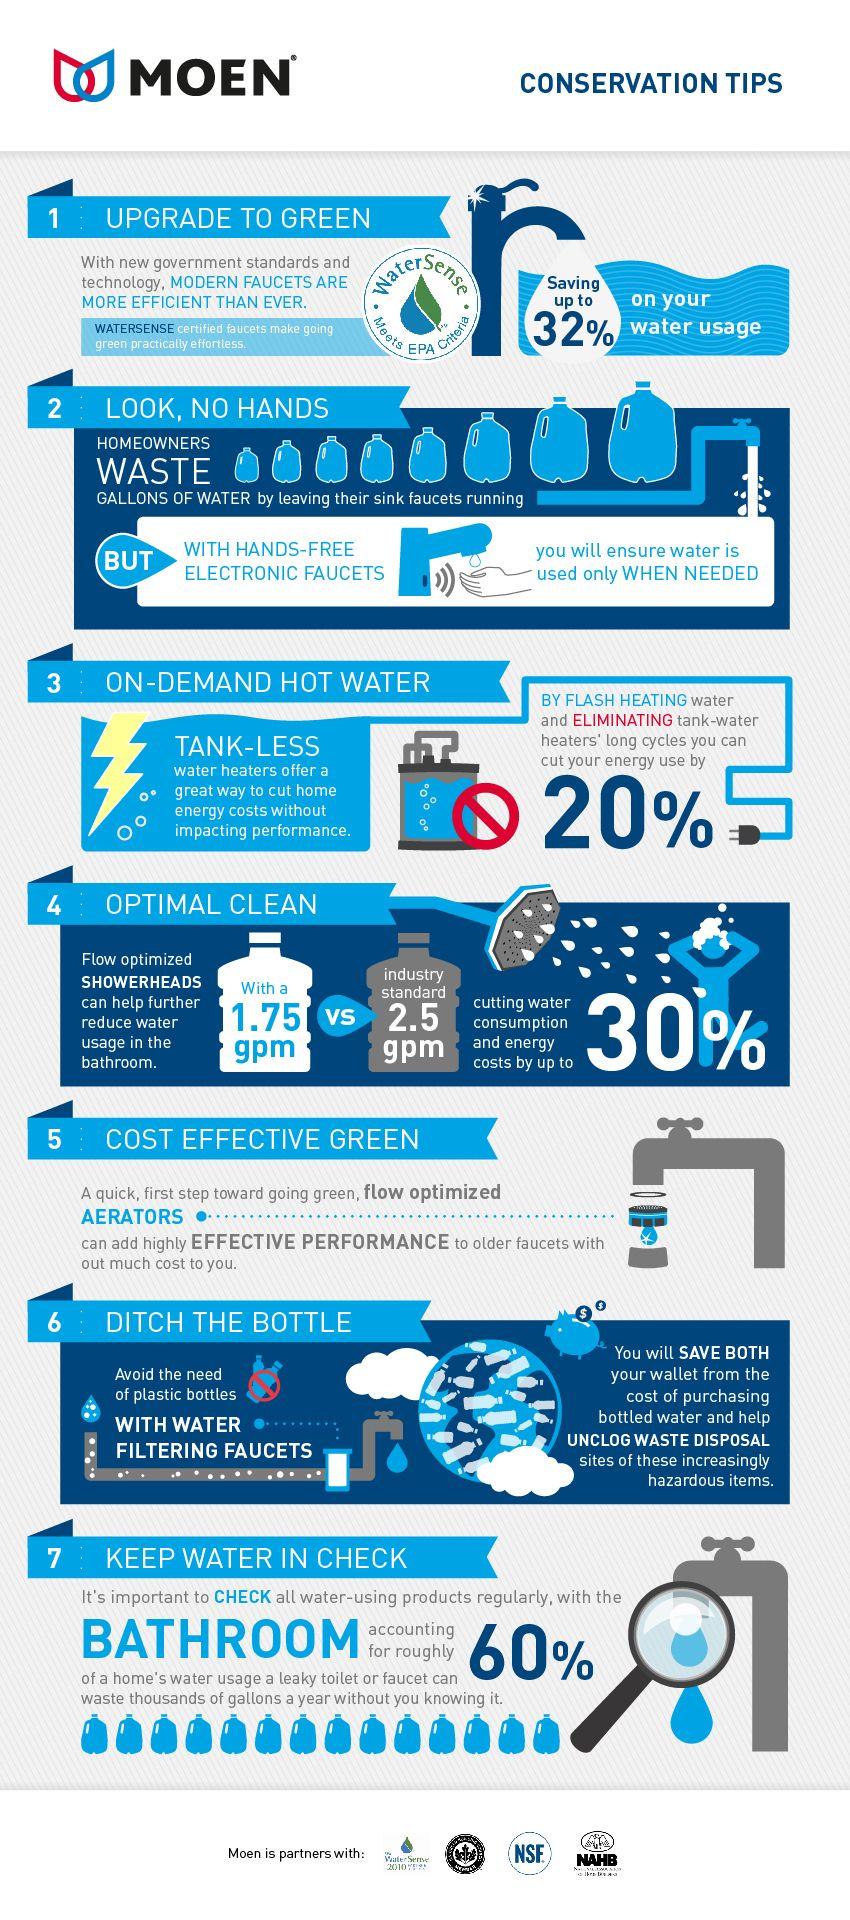 Moen eco-performance tips #infographic. http://bit.ly/lI875i